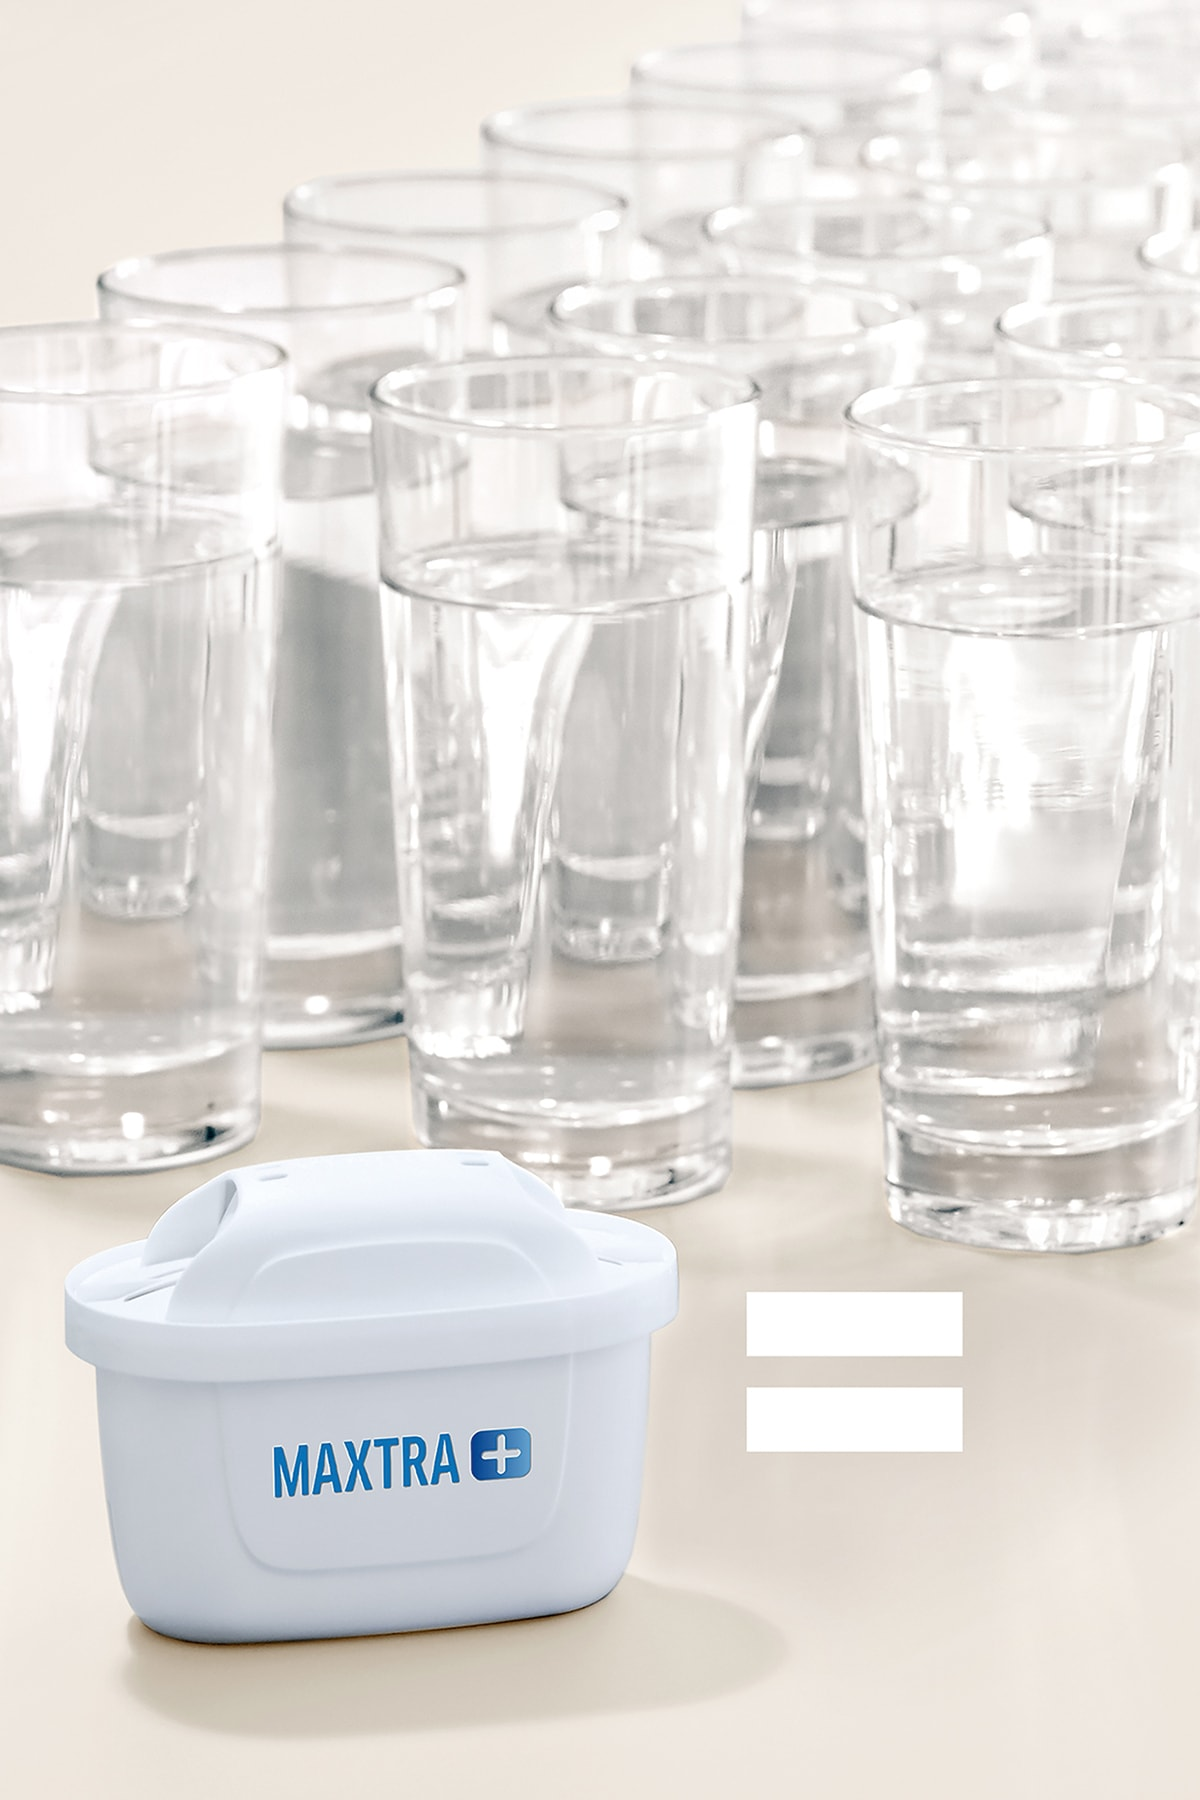 Brita Maxtra + Plus Yeni Nesil Su Arıtma Filtresi Dörtlü